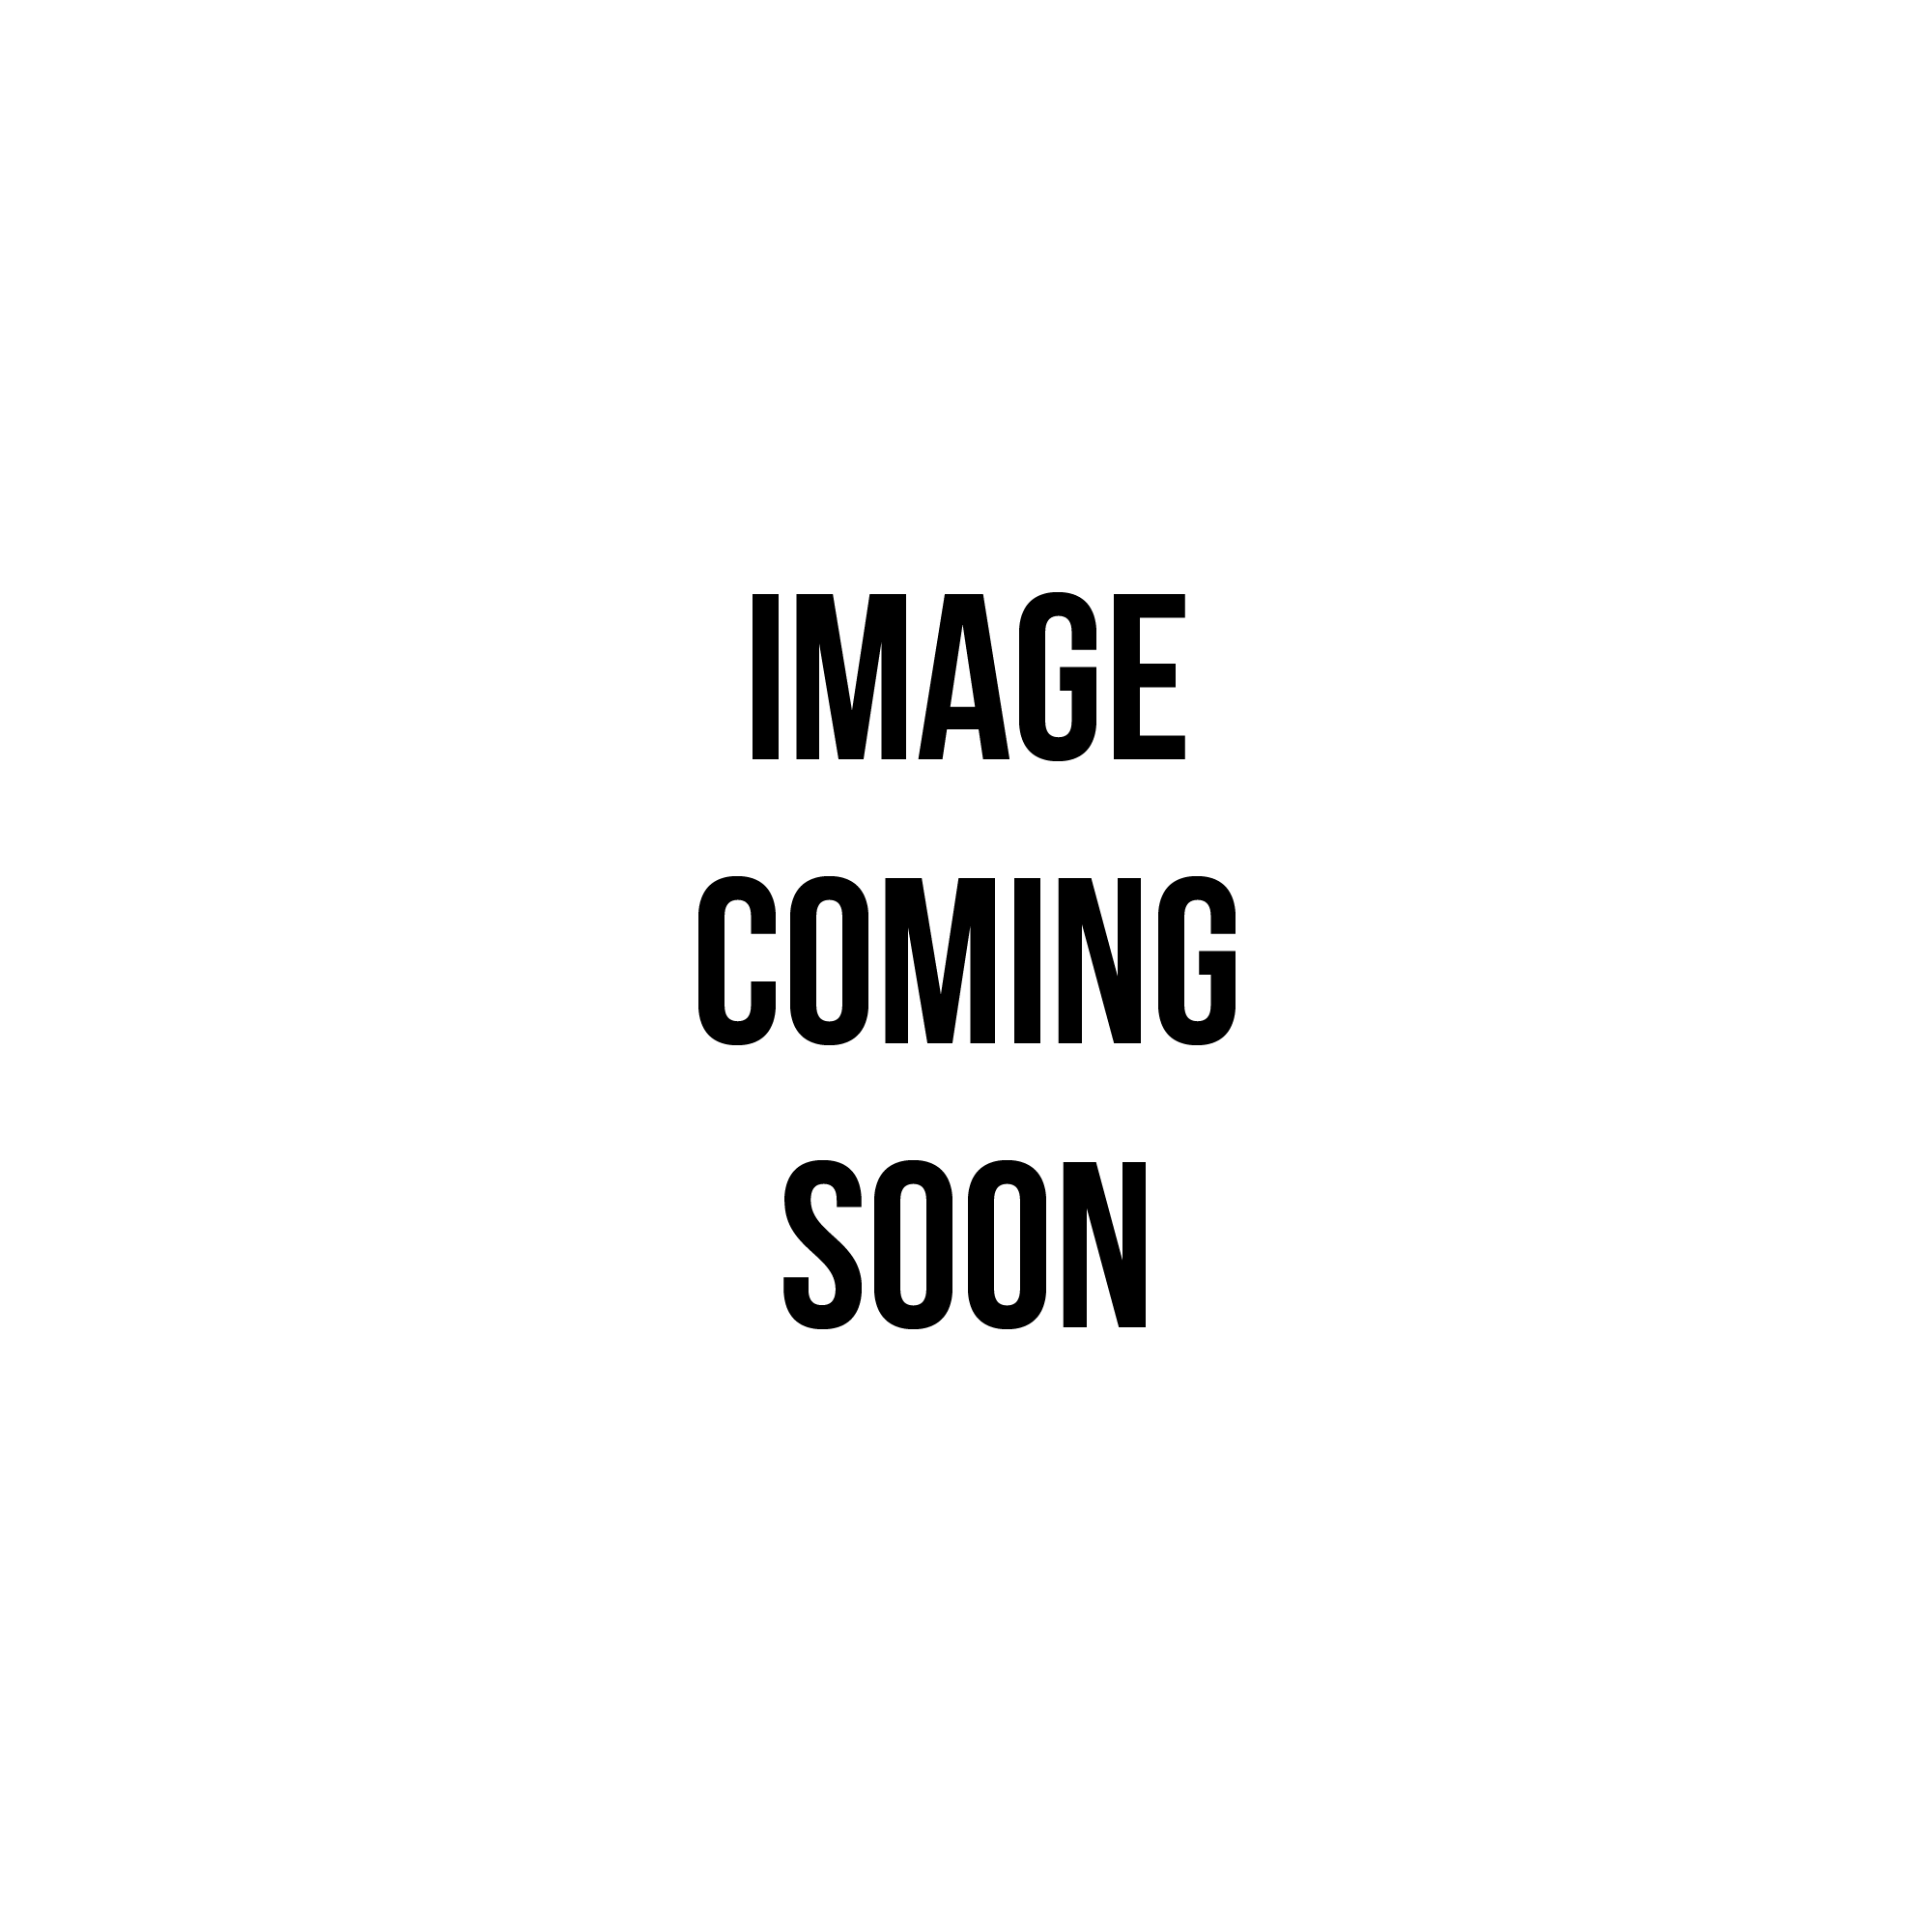 Nike Extrême Rose De Footlocker collections bon marché recommander rabais RcNEMXcTN0